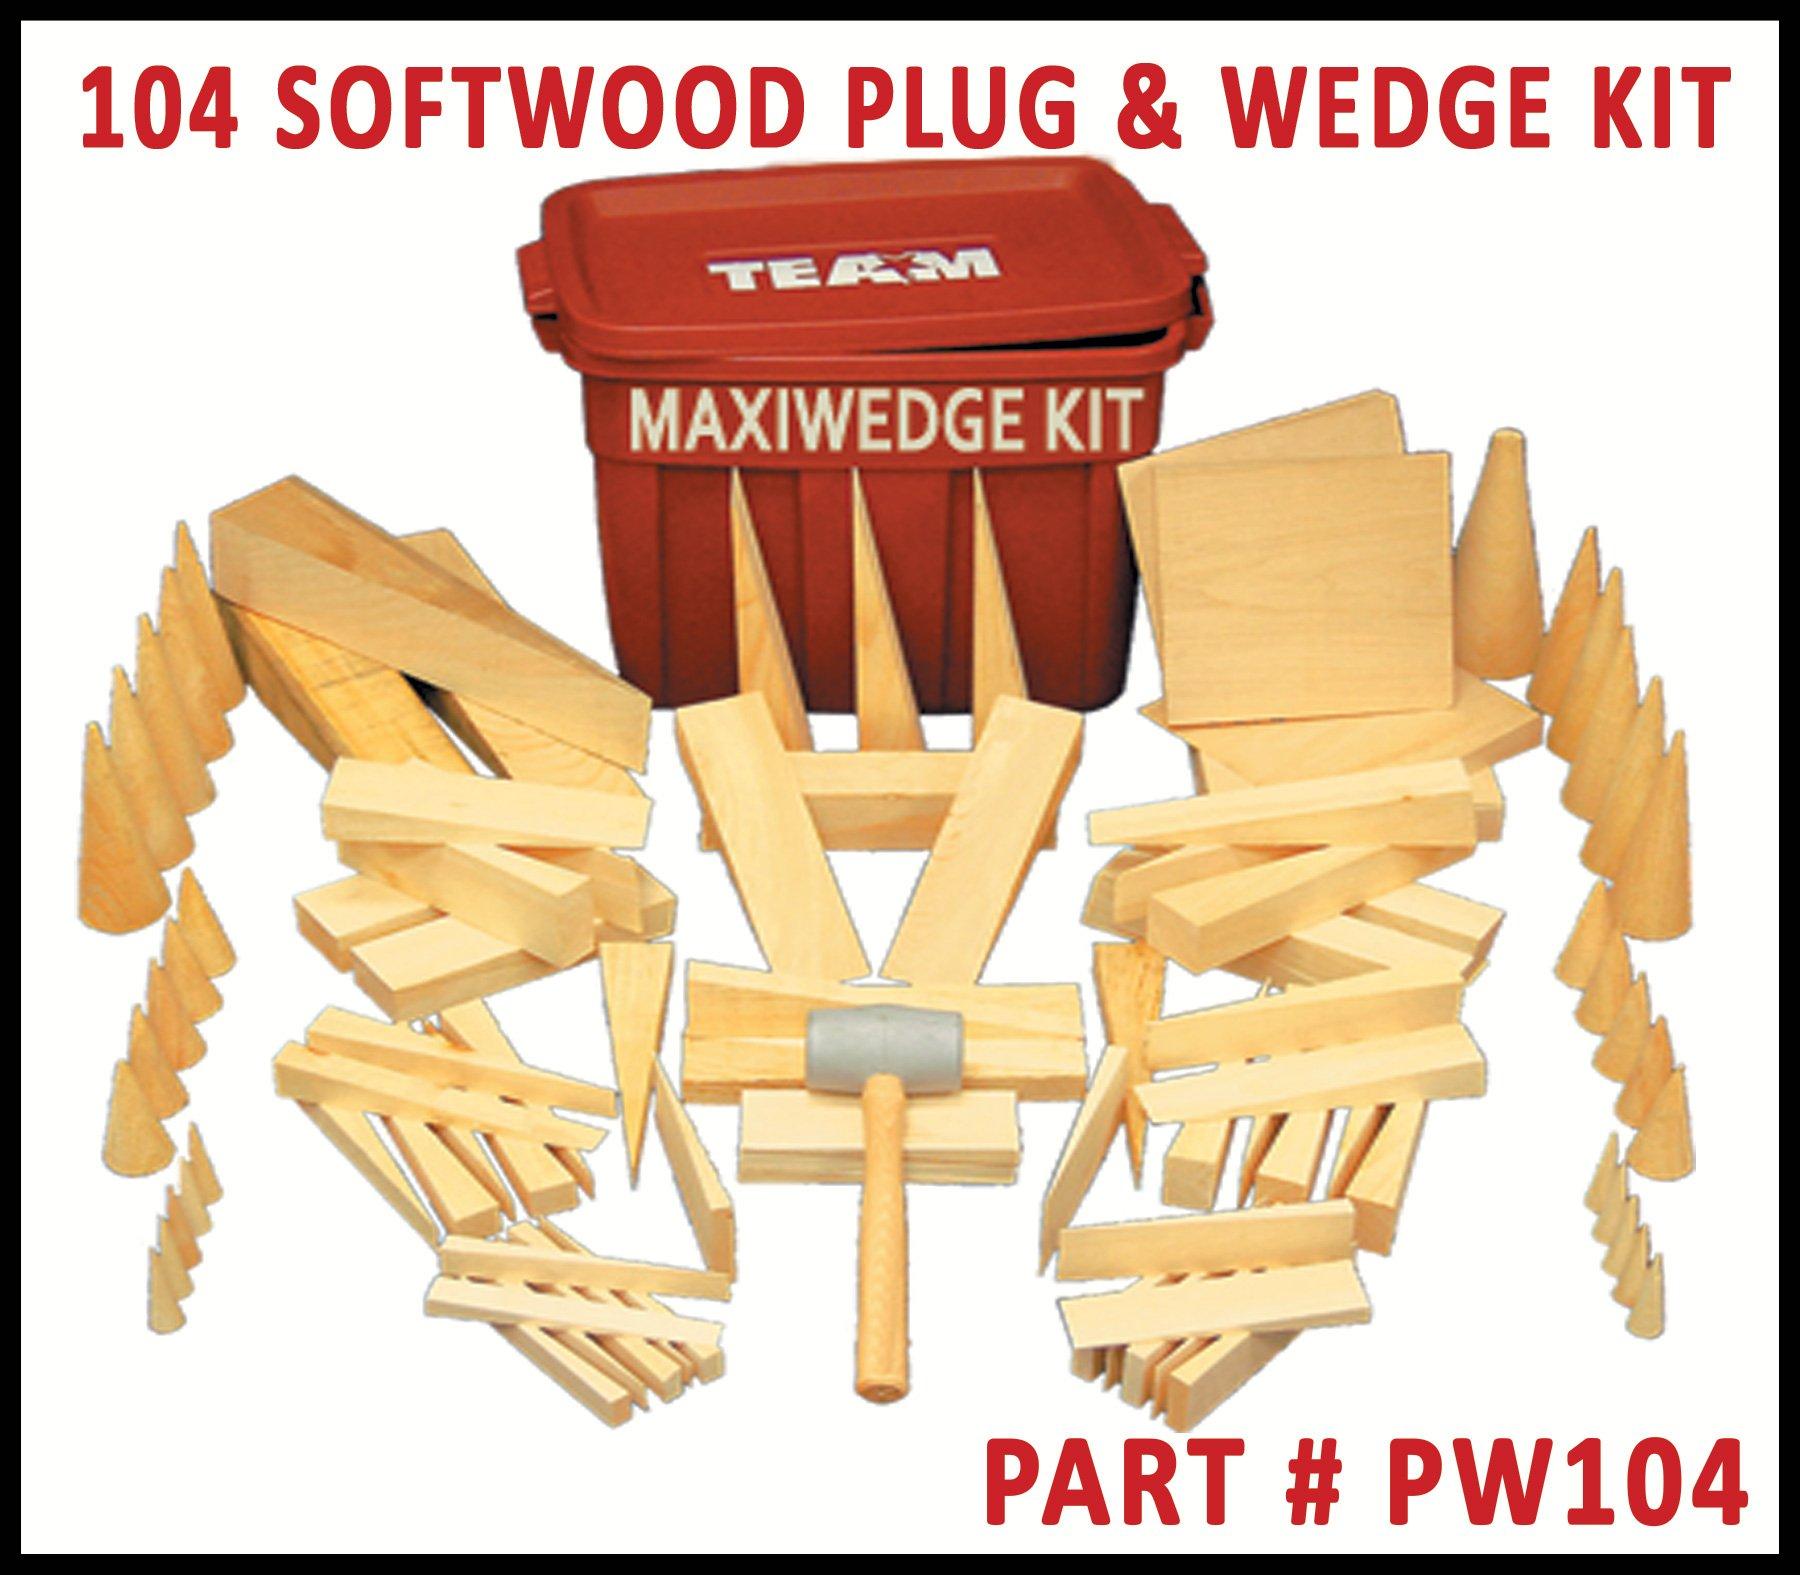 Maxiwedge Plug and Wedge Kit